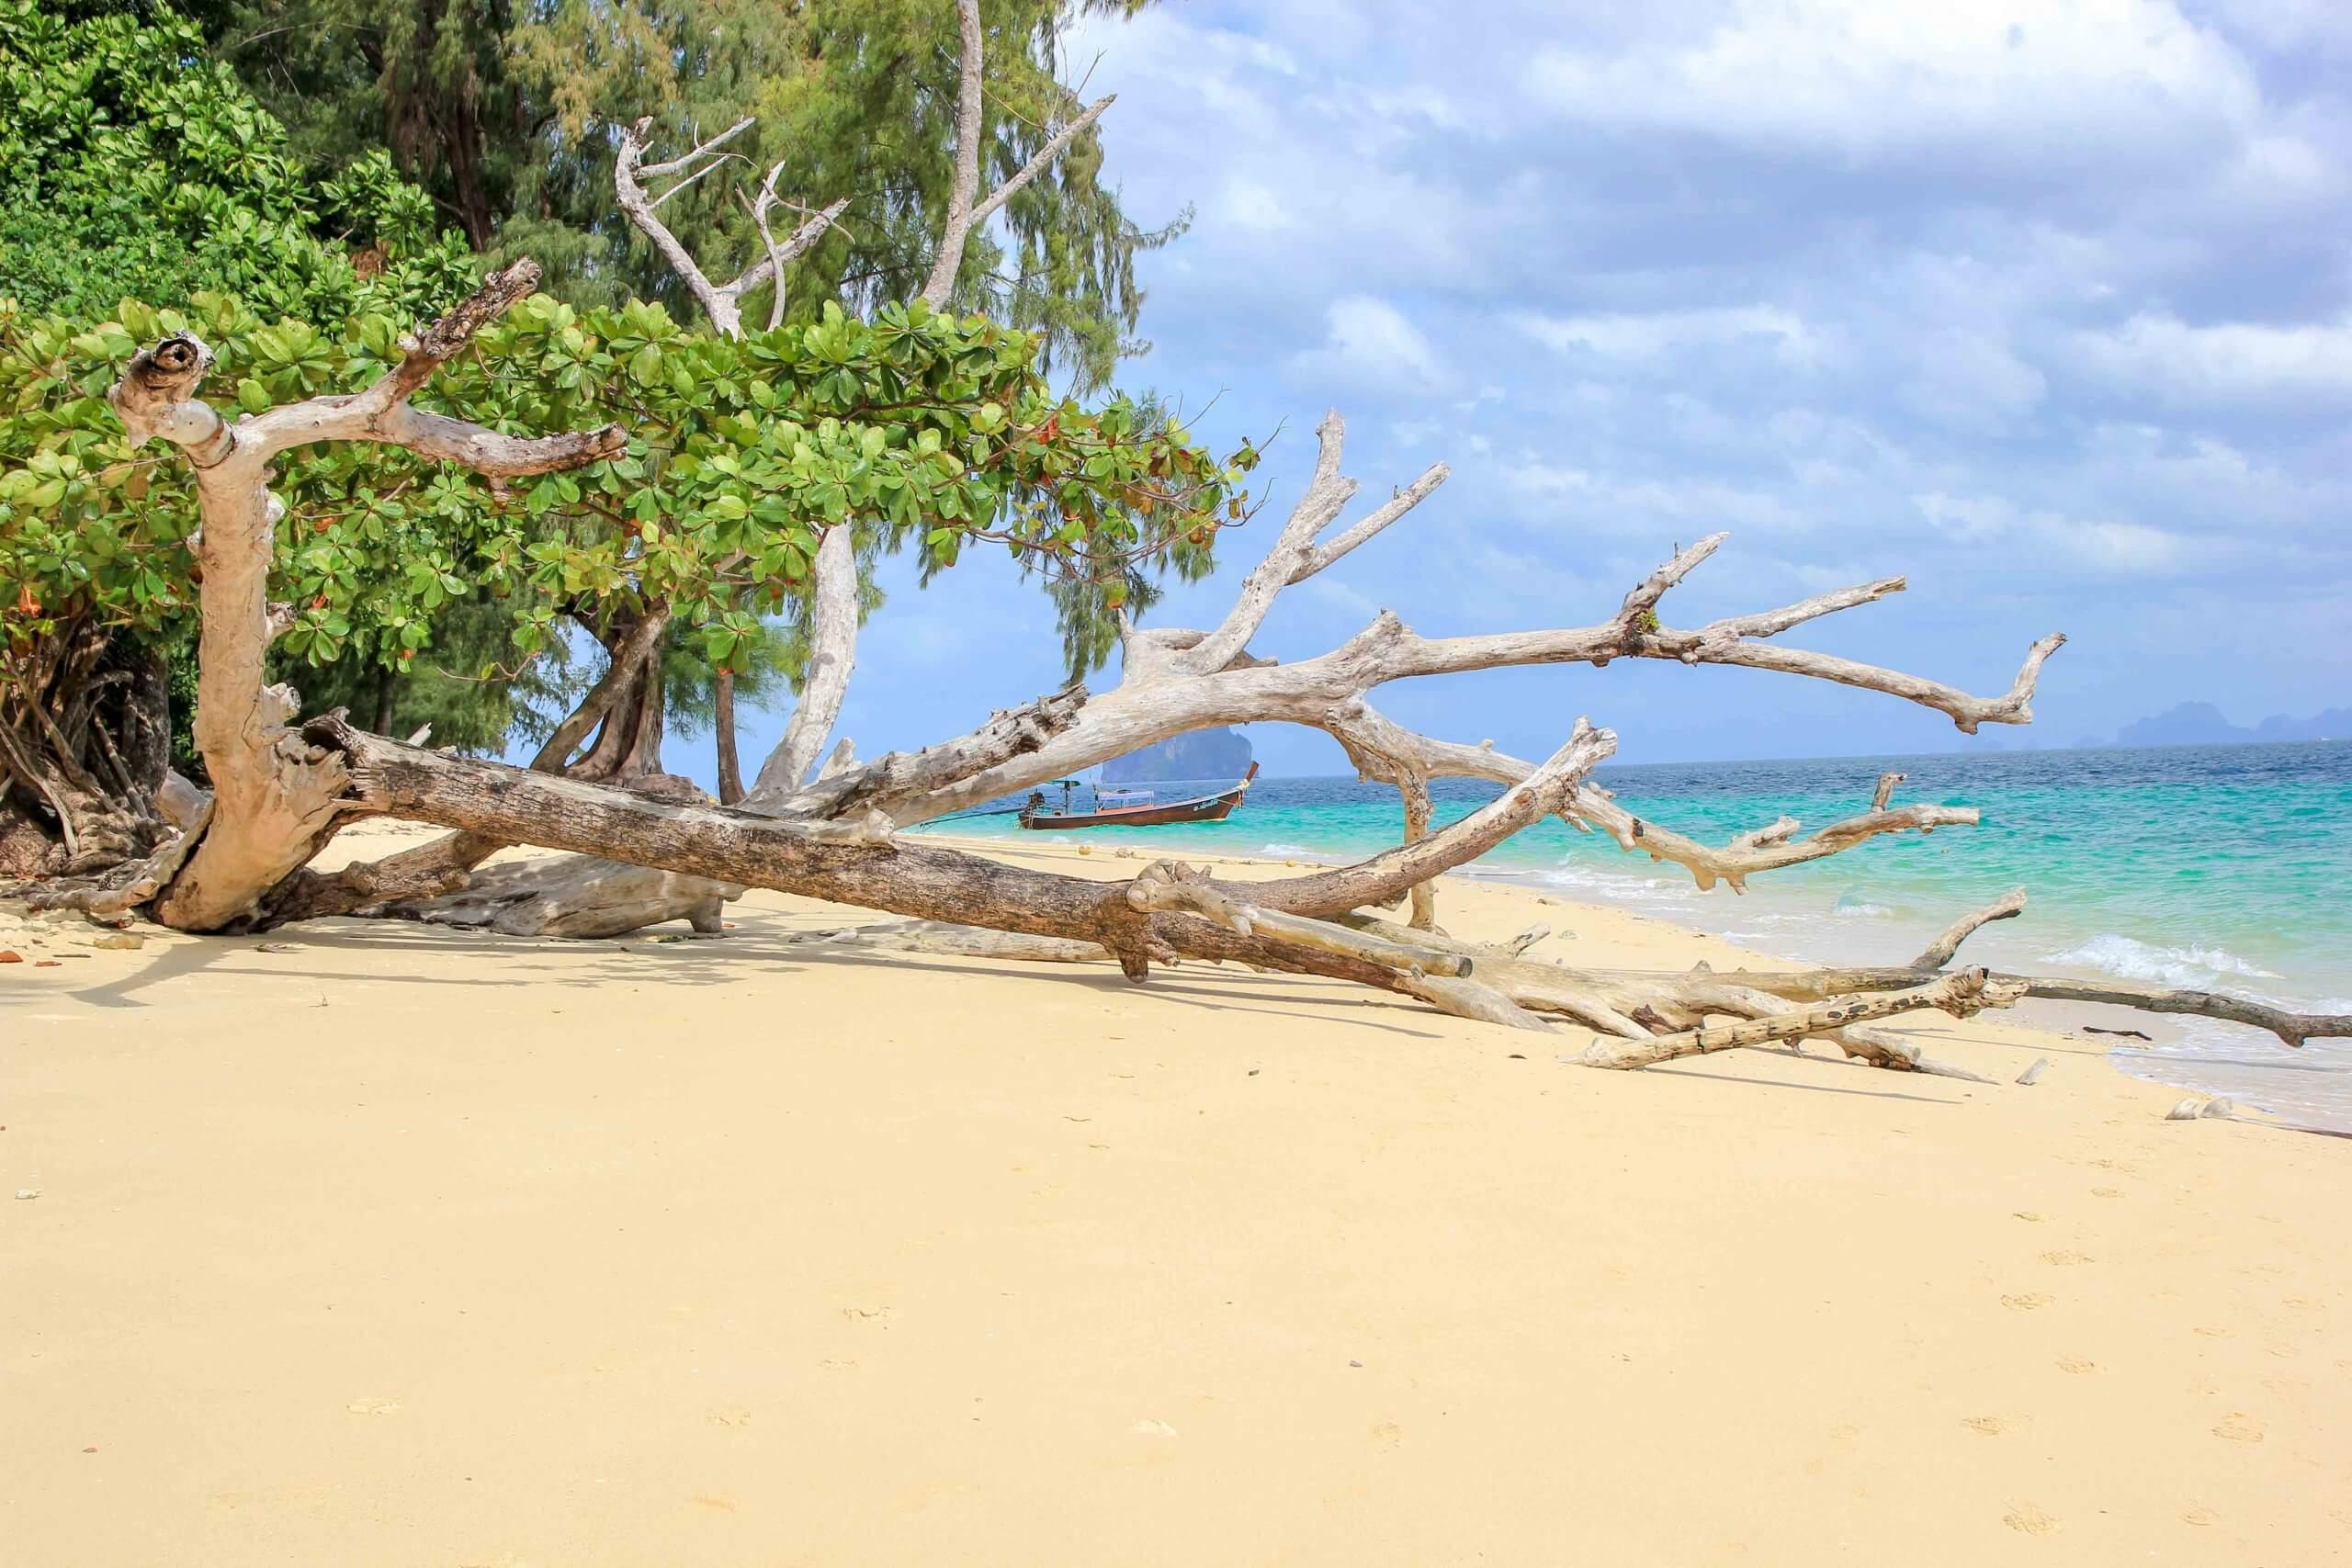 ATASTAY Luxury Hotel Booking | Koh Kradan Beach / Andaman Sea / Thailand // World Beach Guide